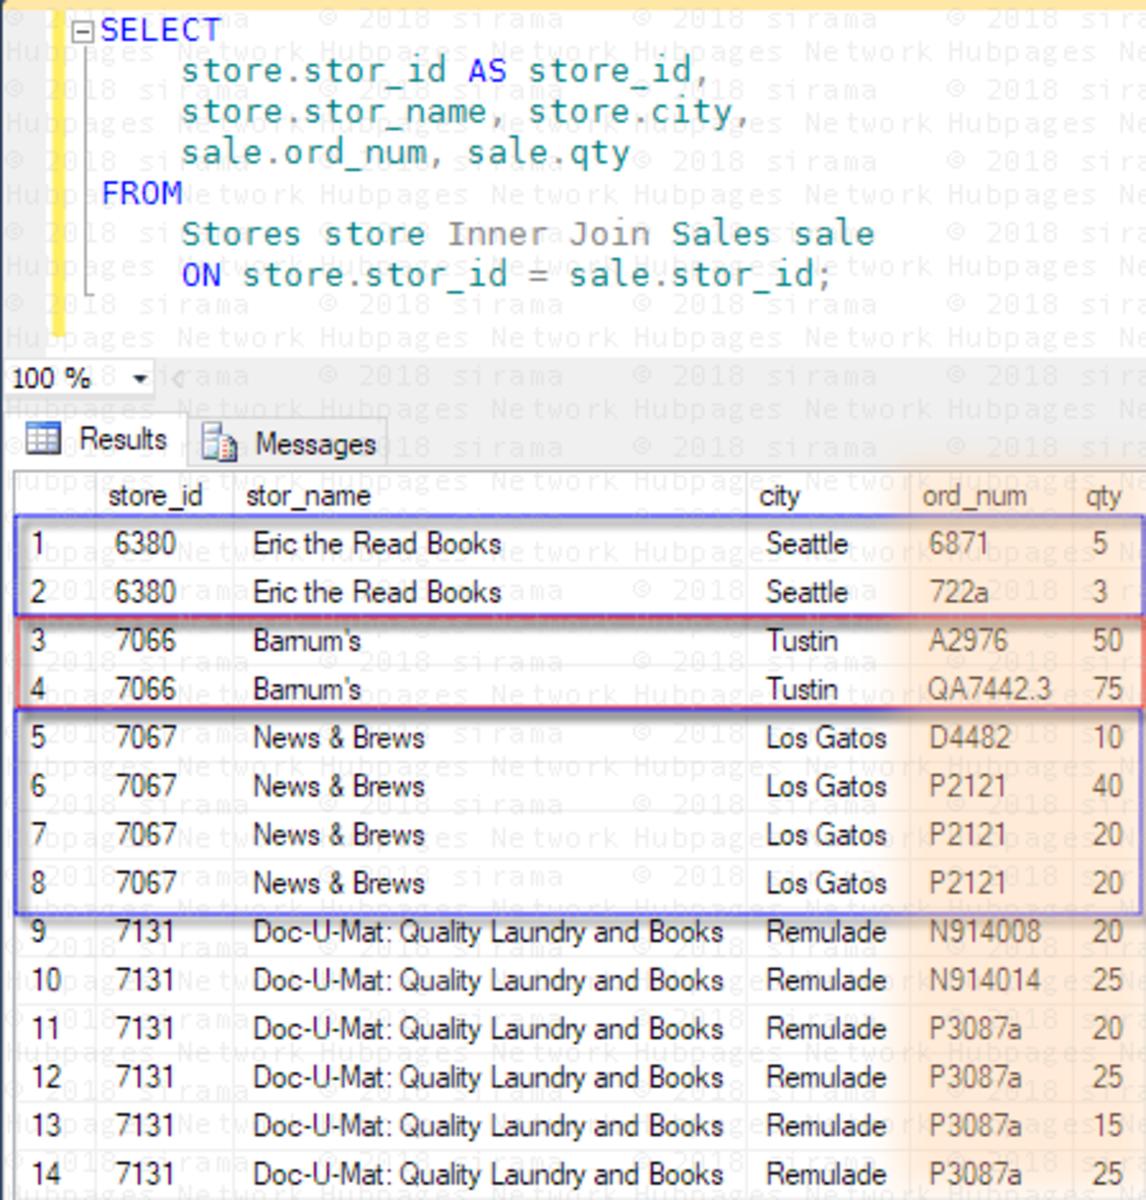 Figure 1: Sales of Stores via Pubs Database